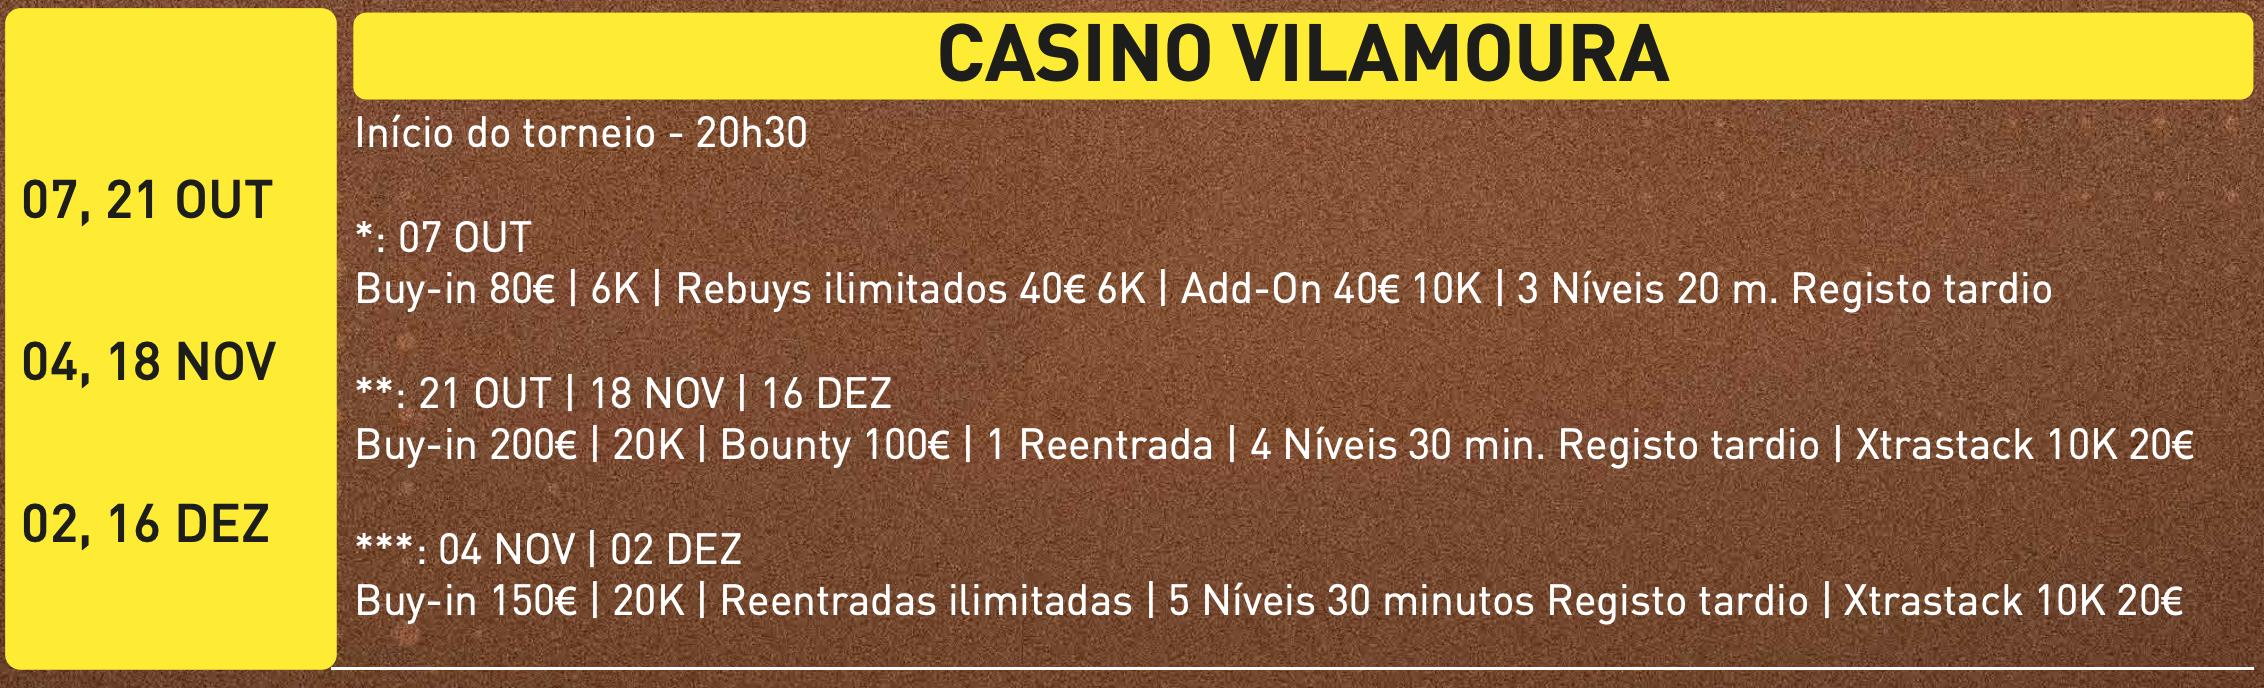 Four Seasons Outono - Casino Vilamoura